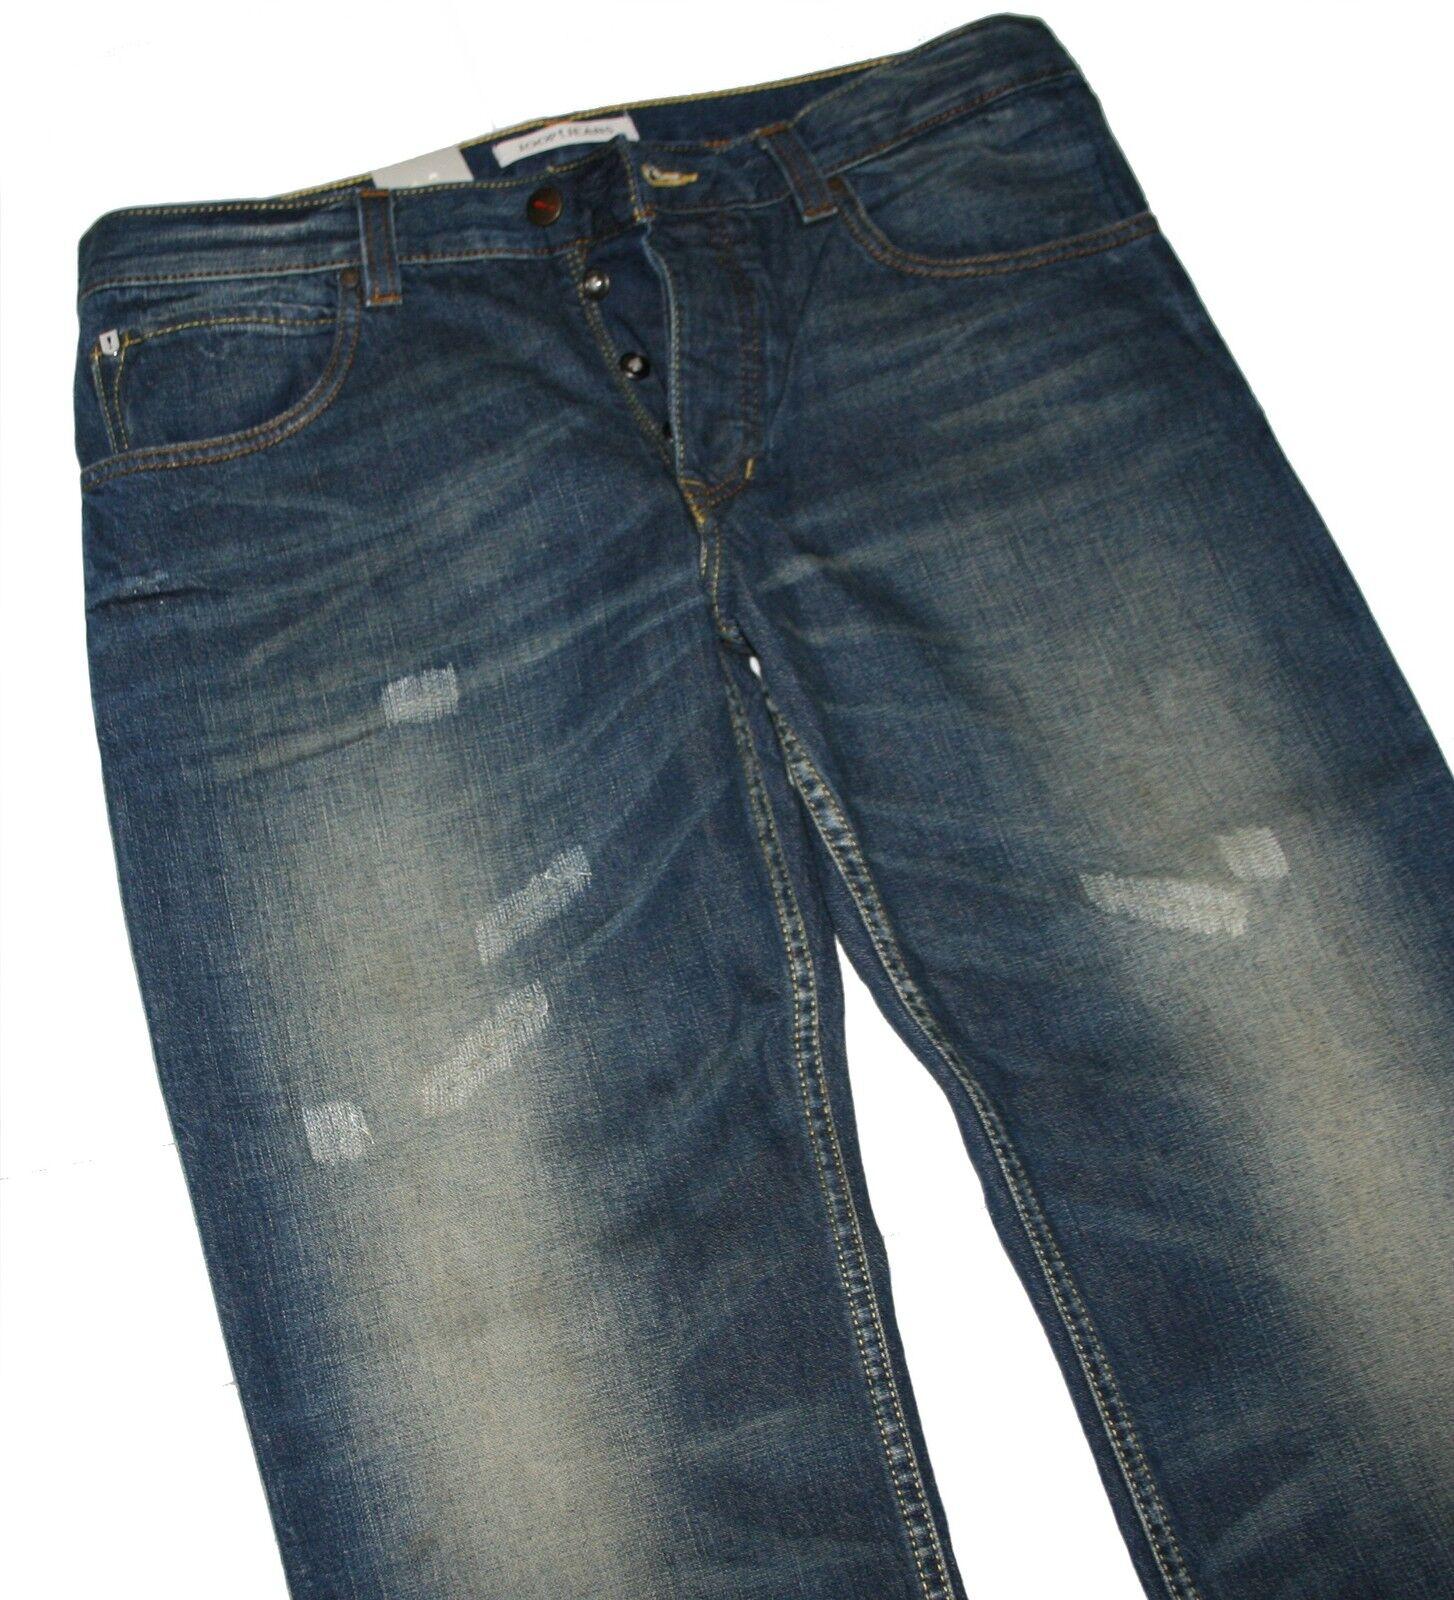 Joop 261036 732 bluee Denim New Romeon Jeans W33 L34 Von Joop